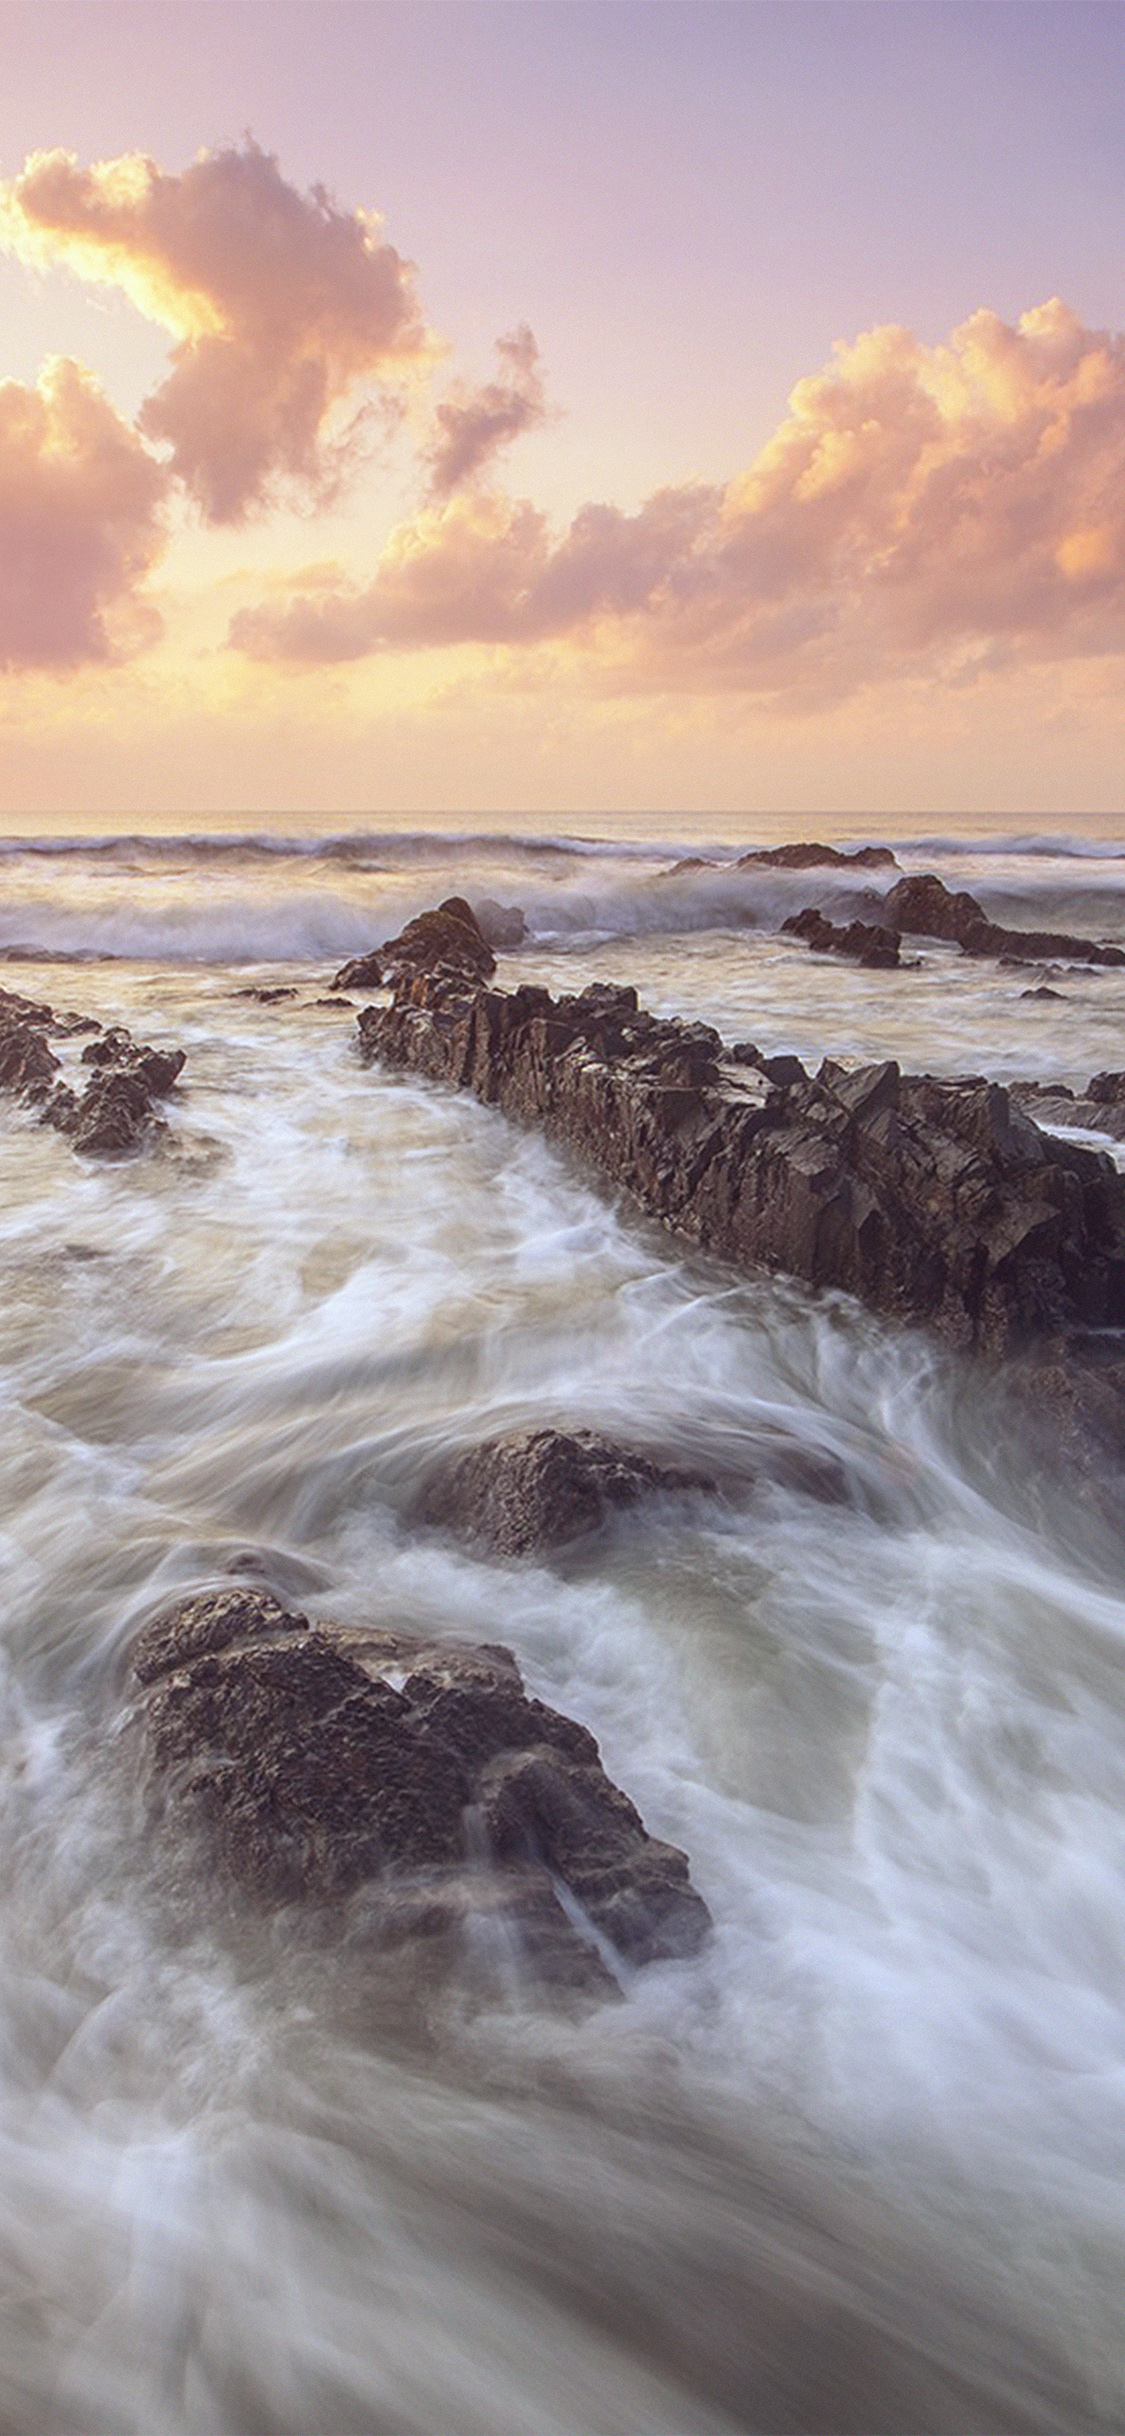 Nf13 Sea Ocean Water Sunset Nature Flare Wallpaper